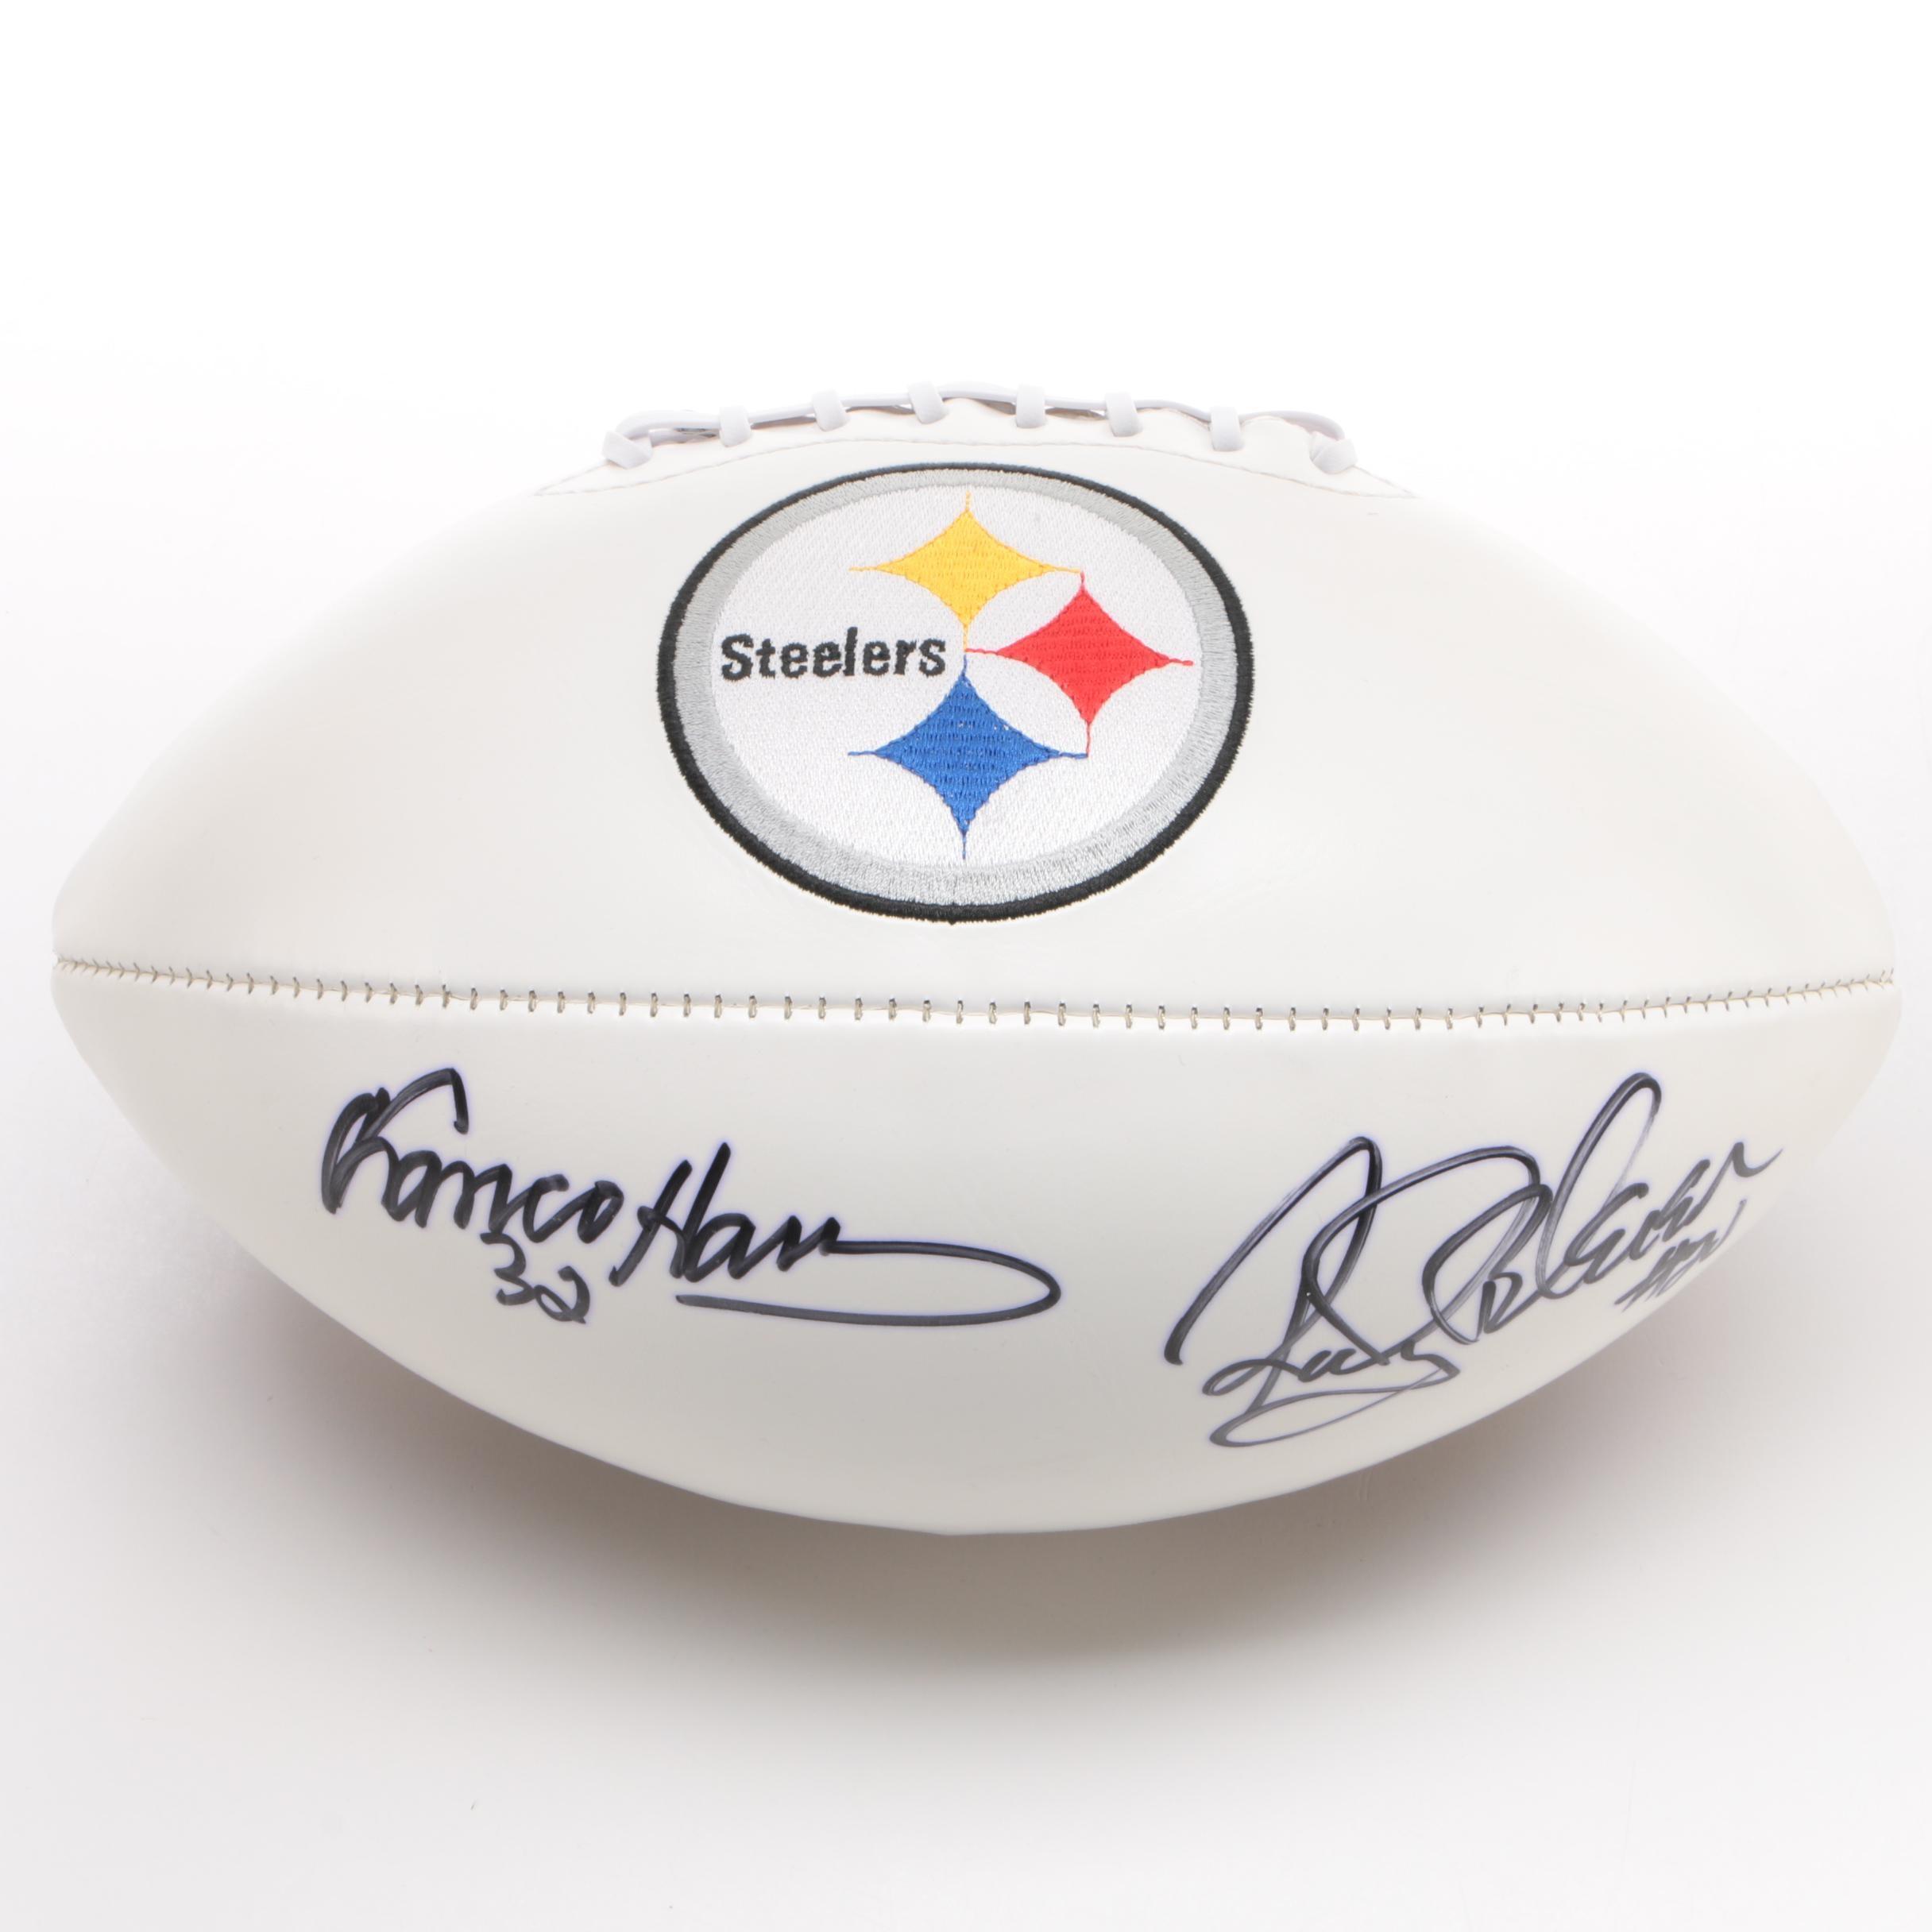 Franco Harris and Rocky Bleier Autographed Steelers Football - JSA COA